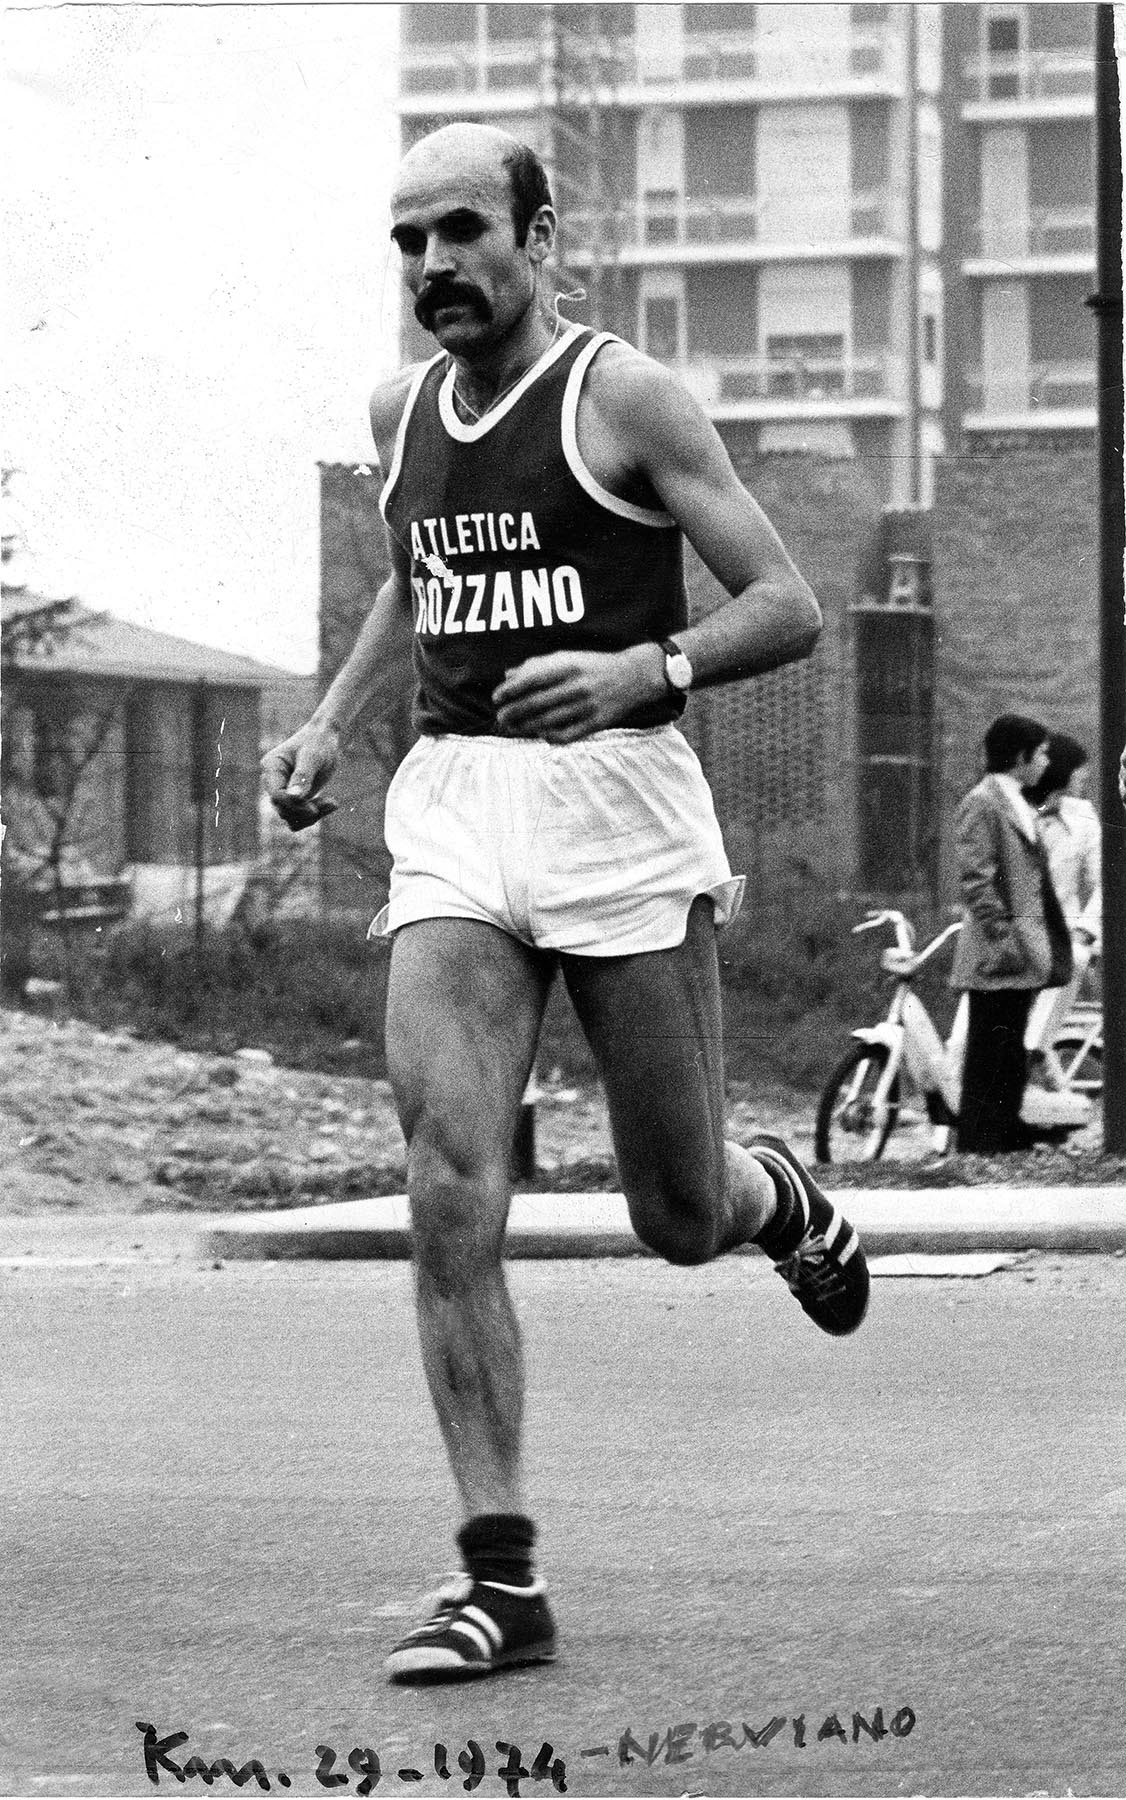 La Corsa 1974